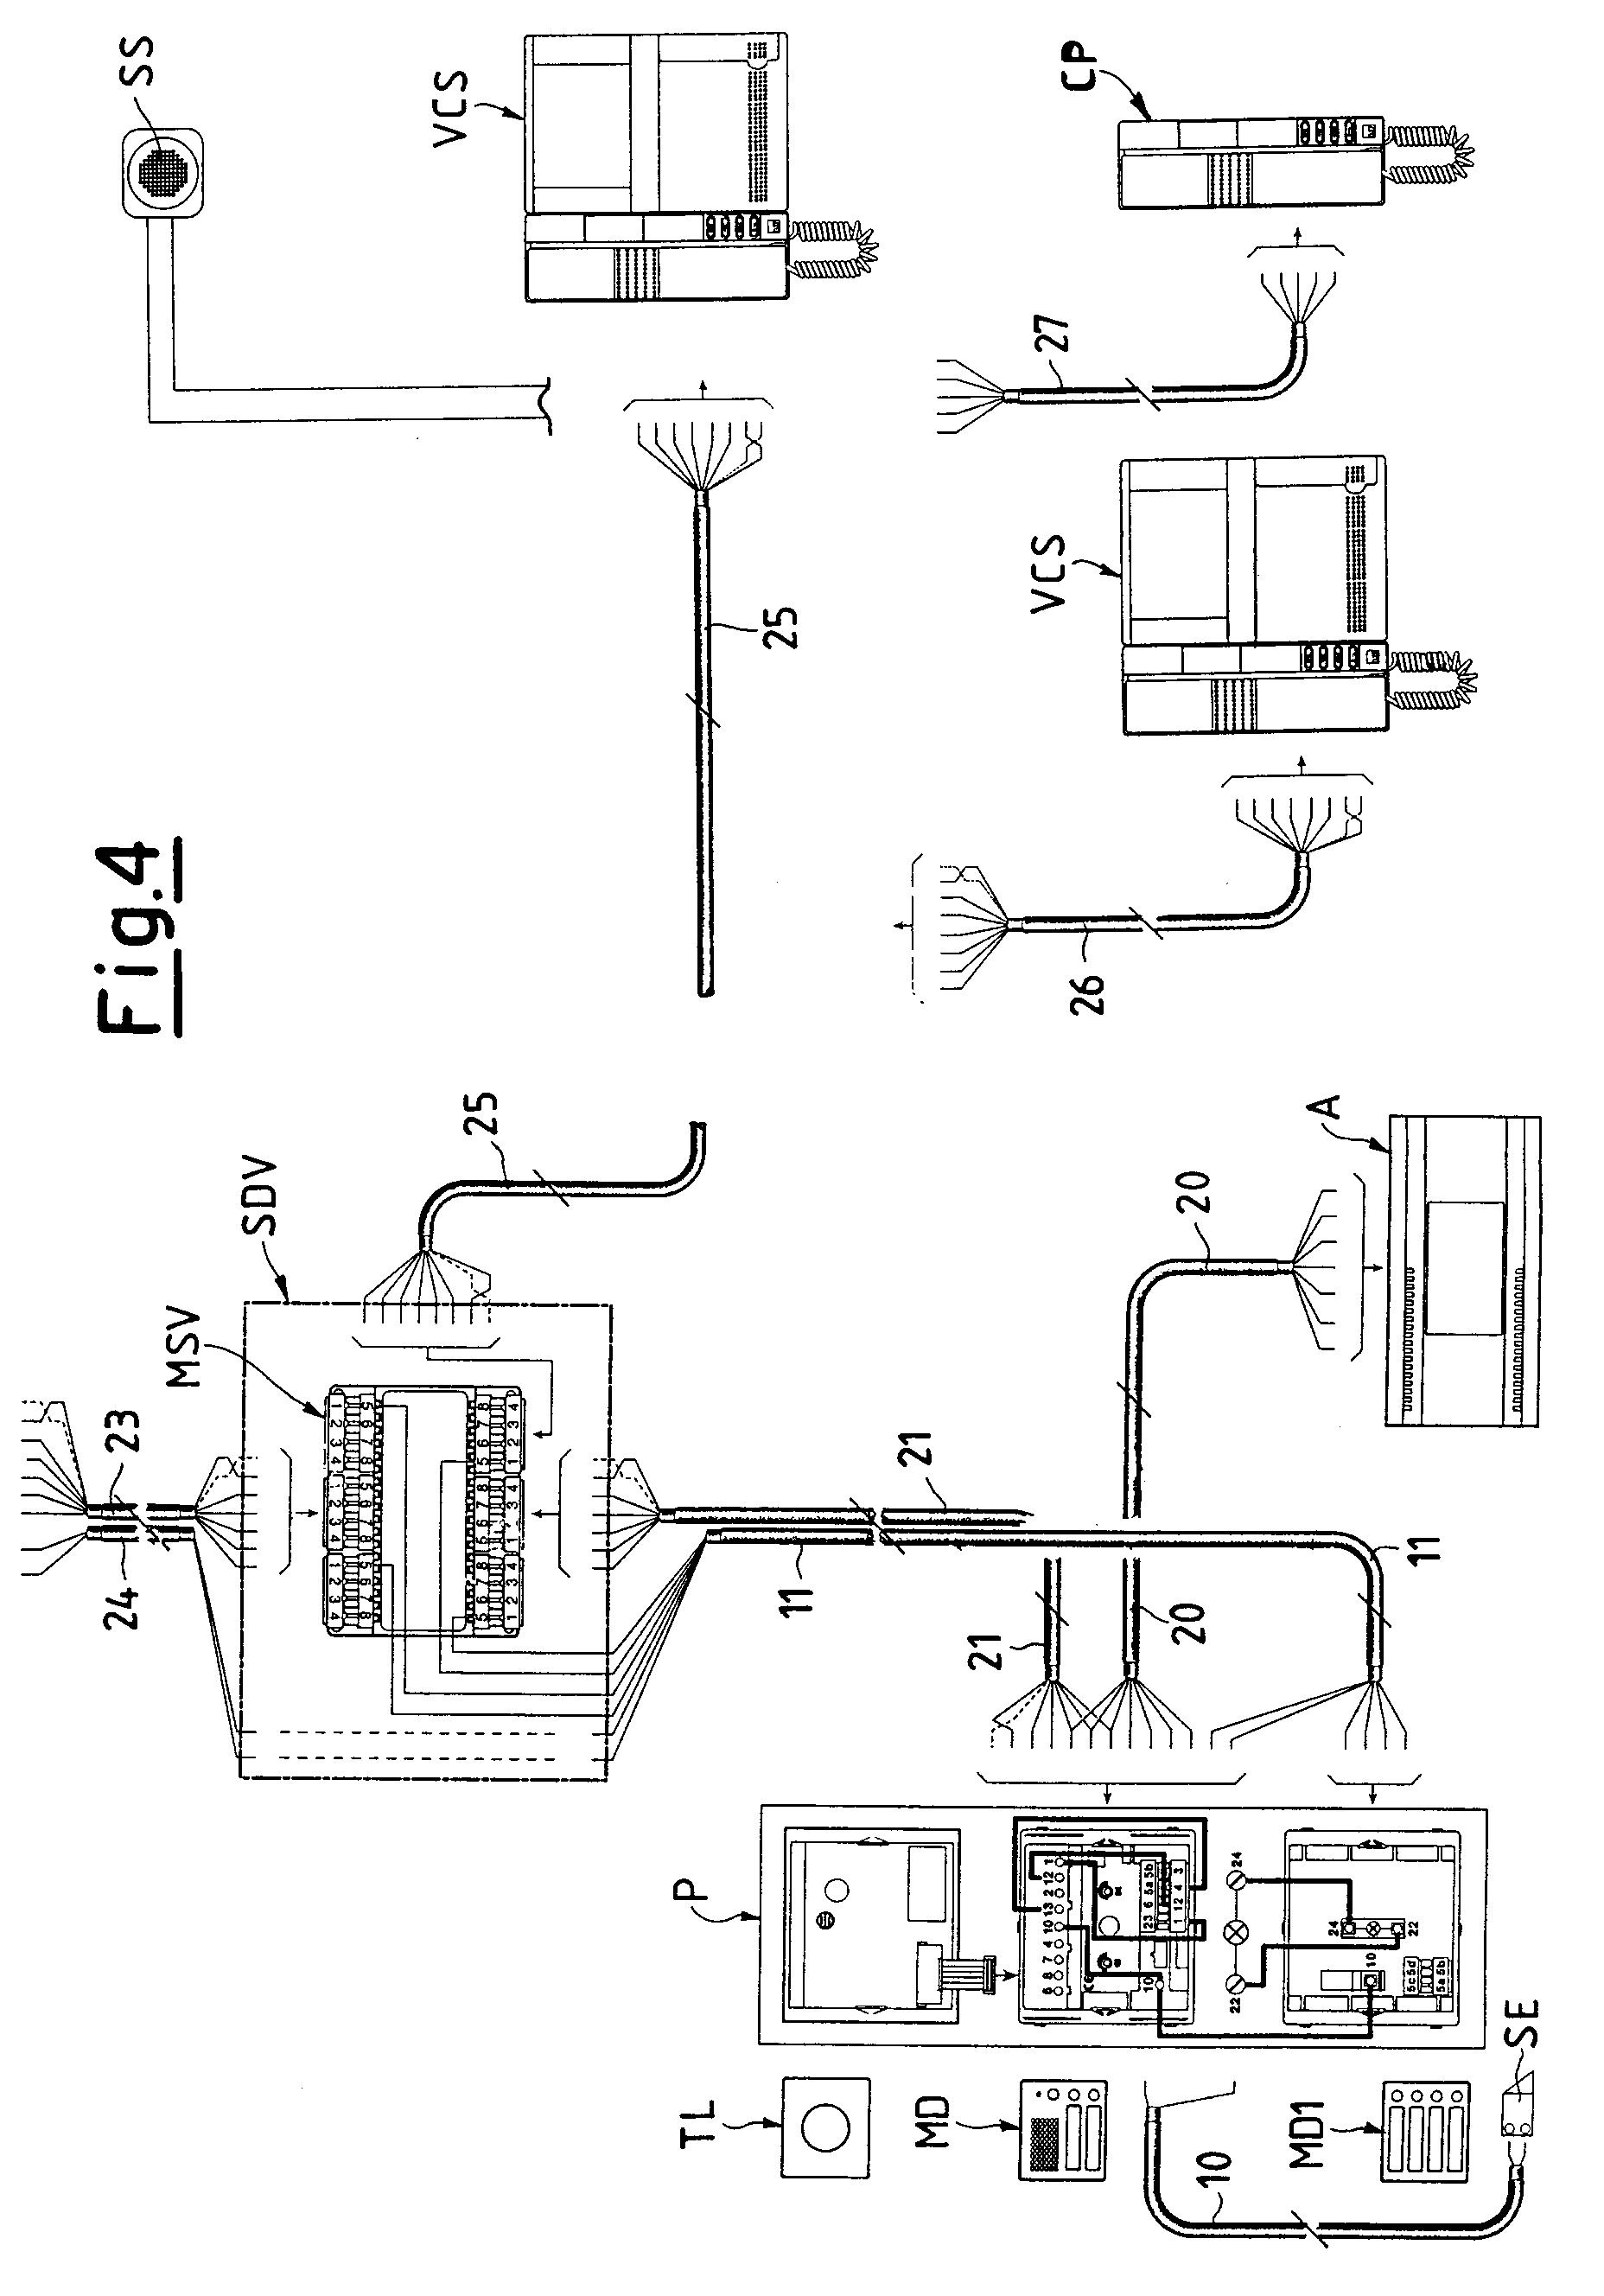 intercom wiring diagram nailor vav free diagrams